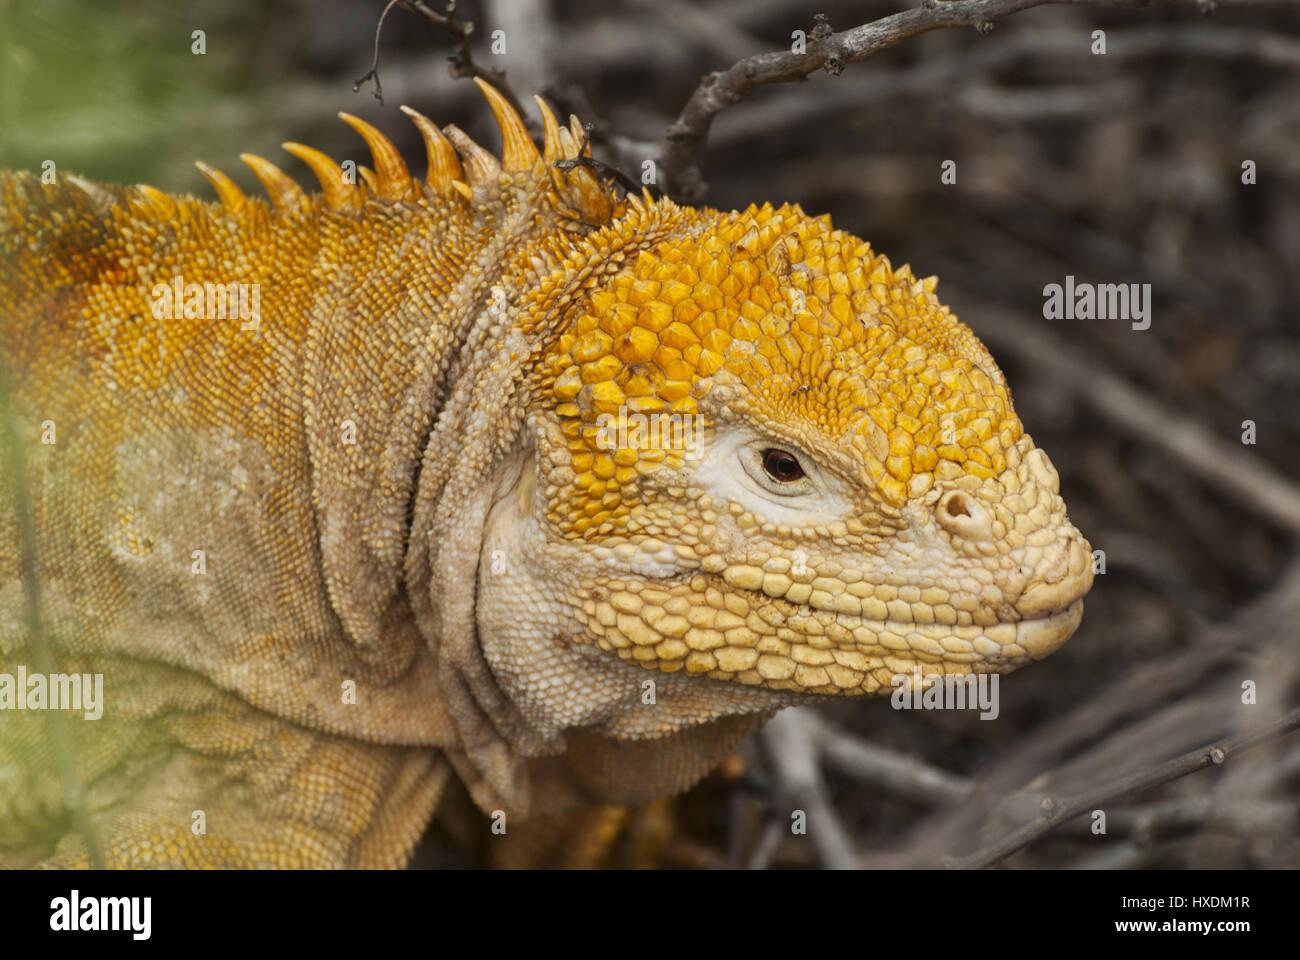 Ecuador, Galapagos, Isabela island, Bay Urbino, land iguana - Stock Image